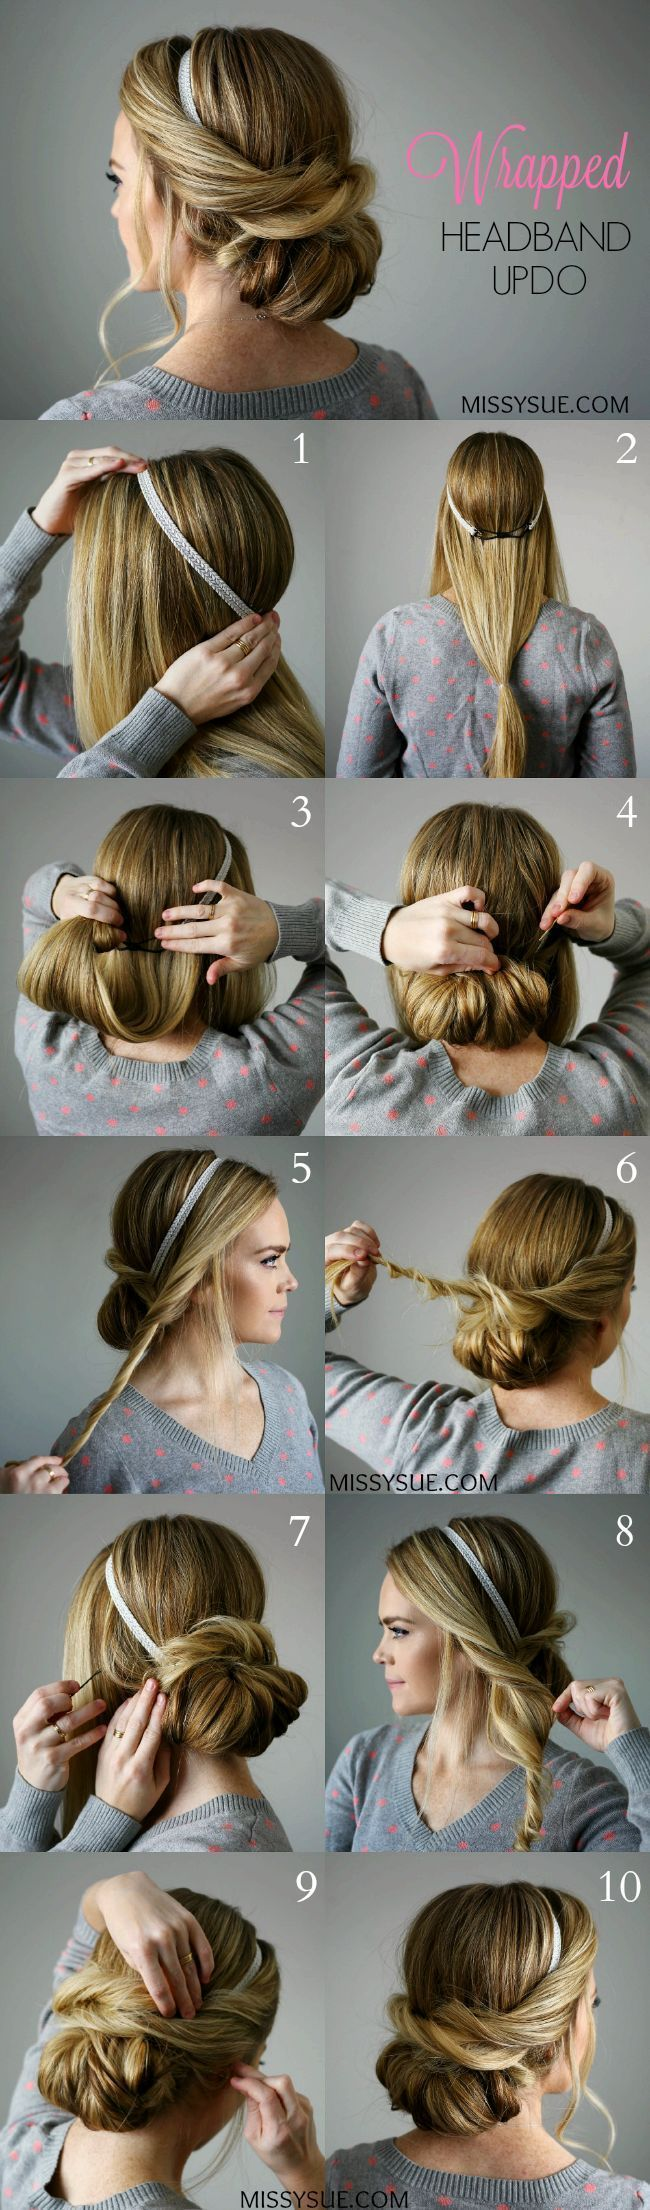 Wedding hairstyles tutorial best photos wedding hairstyles